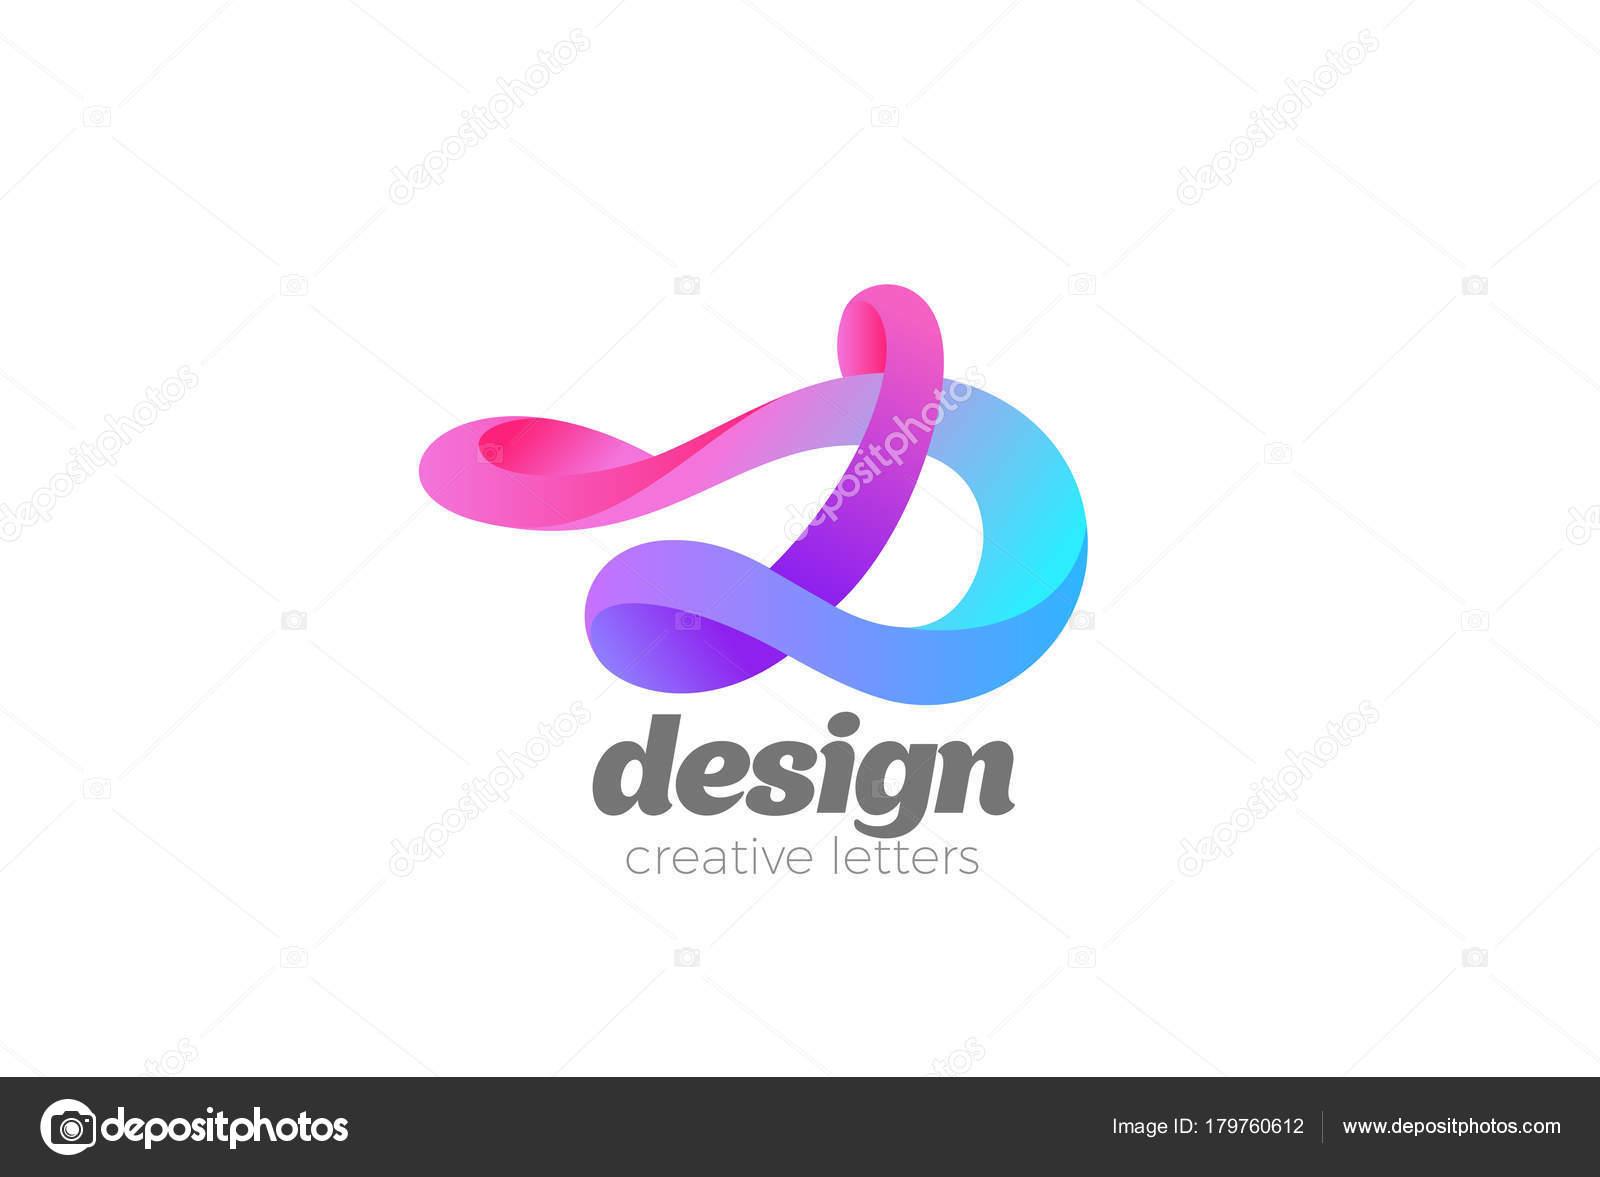 Calligraphic Letter D Logo Colorful Ribbon Design Vector Template Calligraphy Monogram Type Logotype Vintage Icon By Sentavio